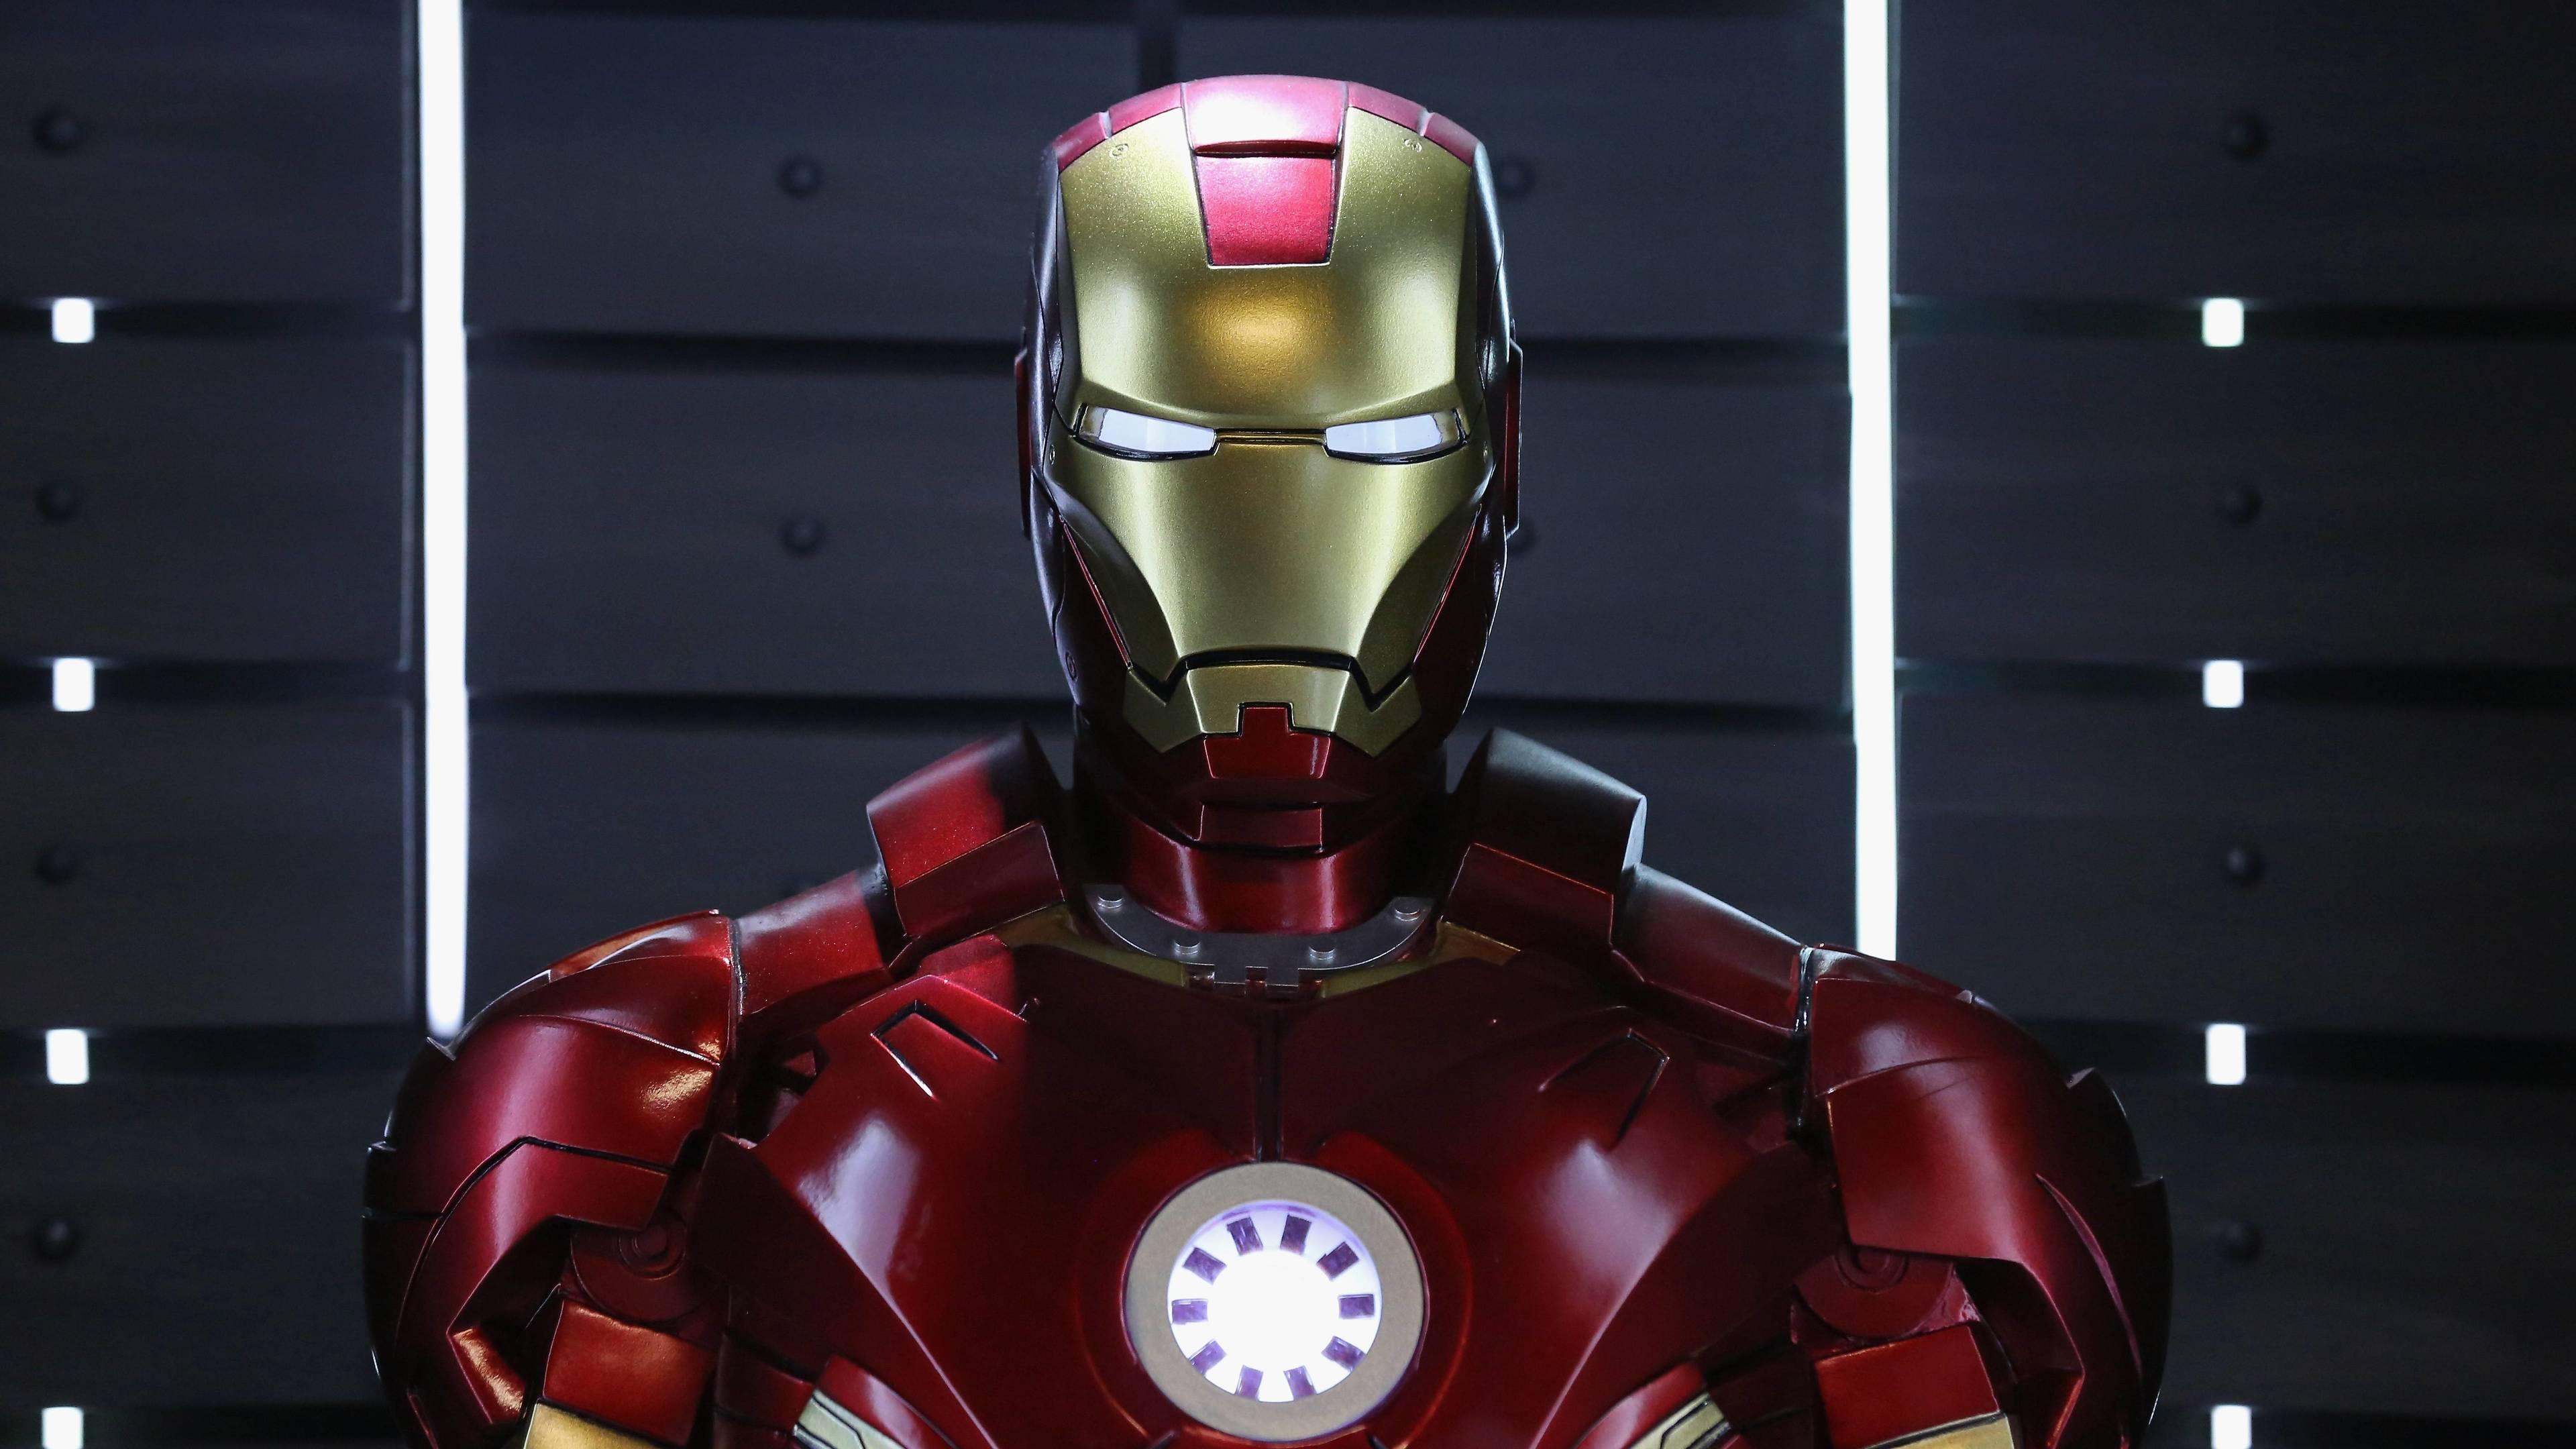 iron man new 4k 1550511886 - Iron Man New 4k - superheroes wallpapers, iron man wallpapers, hd-wallpapers, artwork wallpapers, 5k wallpapers, 4k-wallpapers